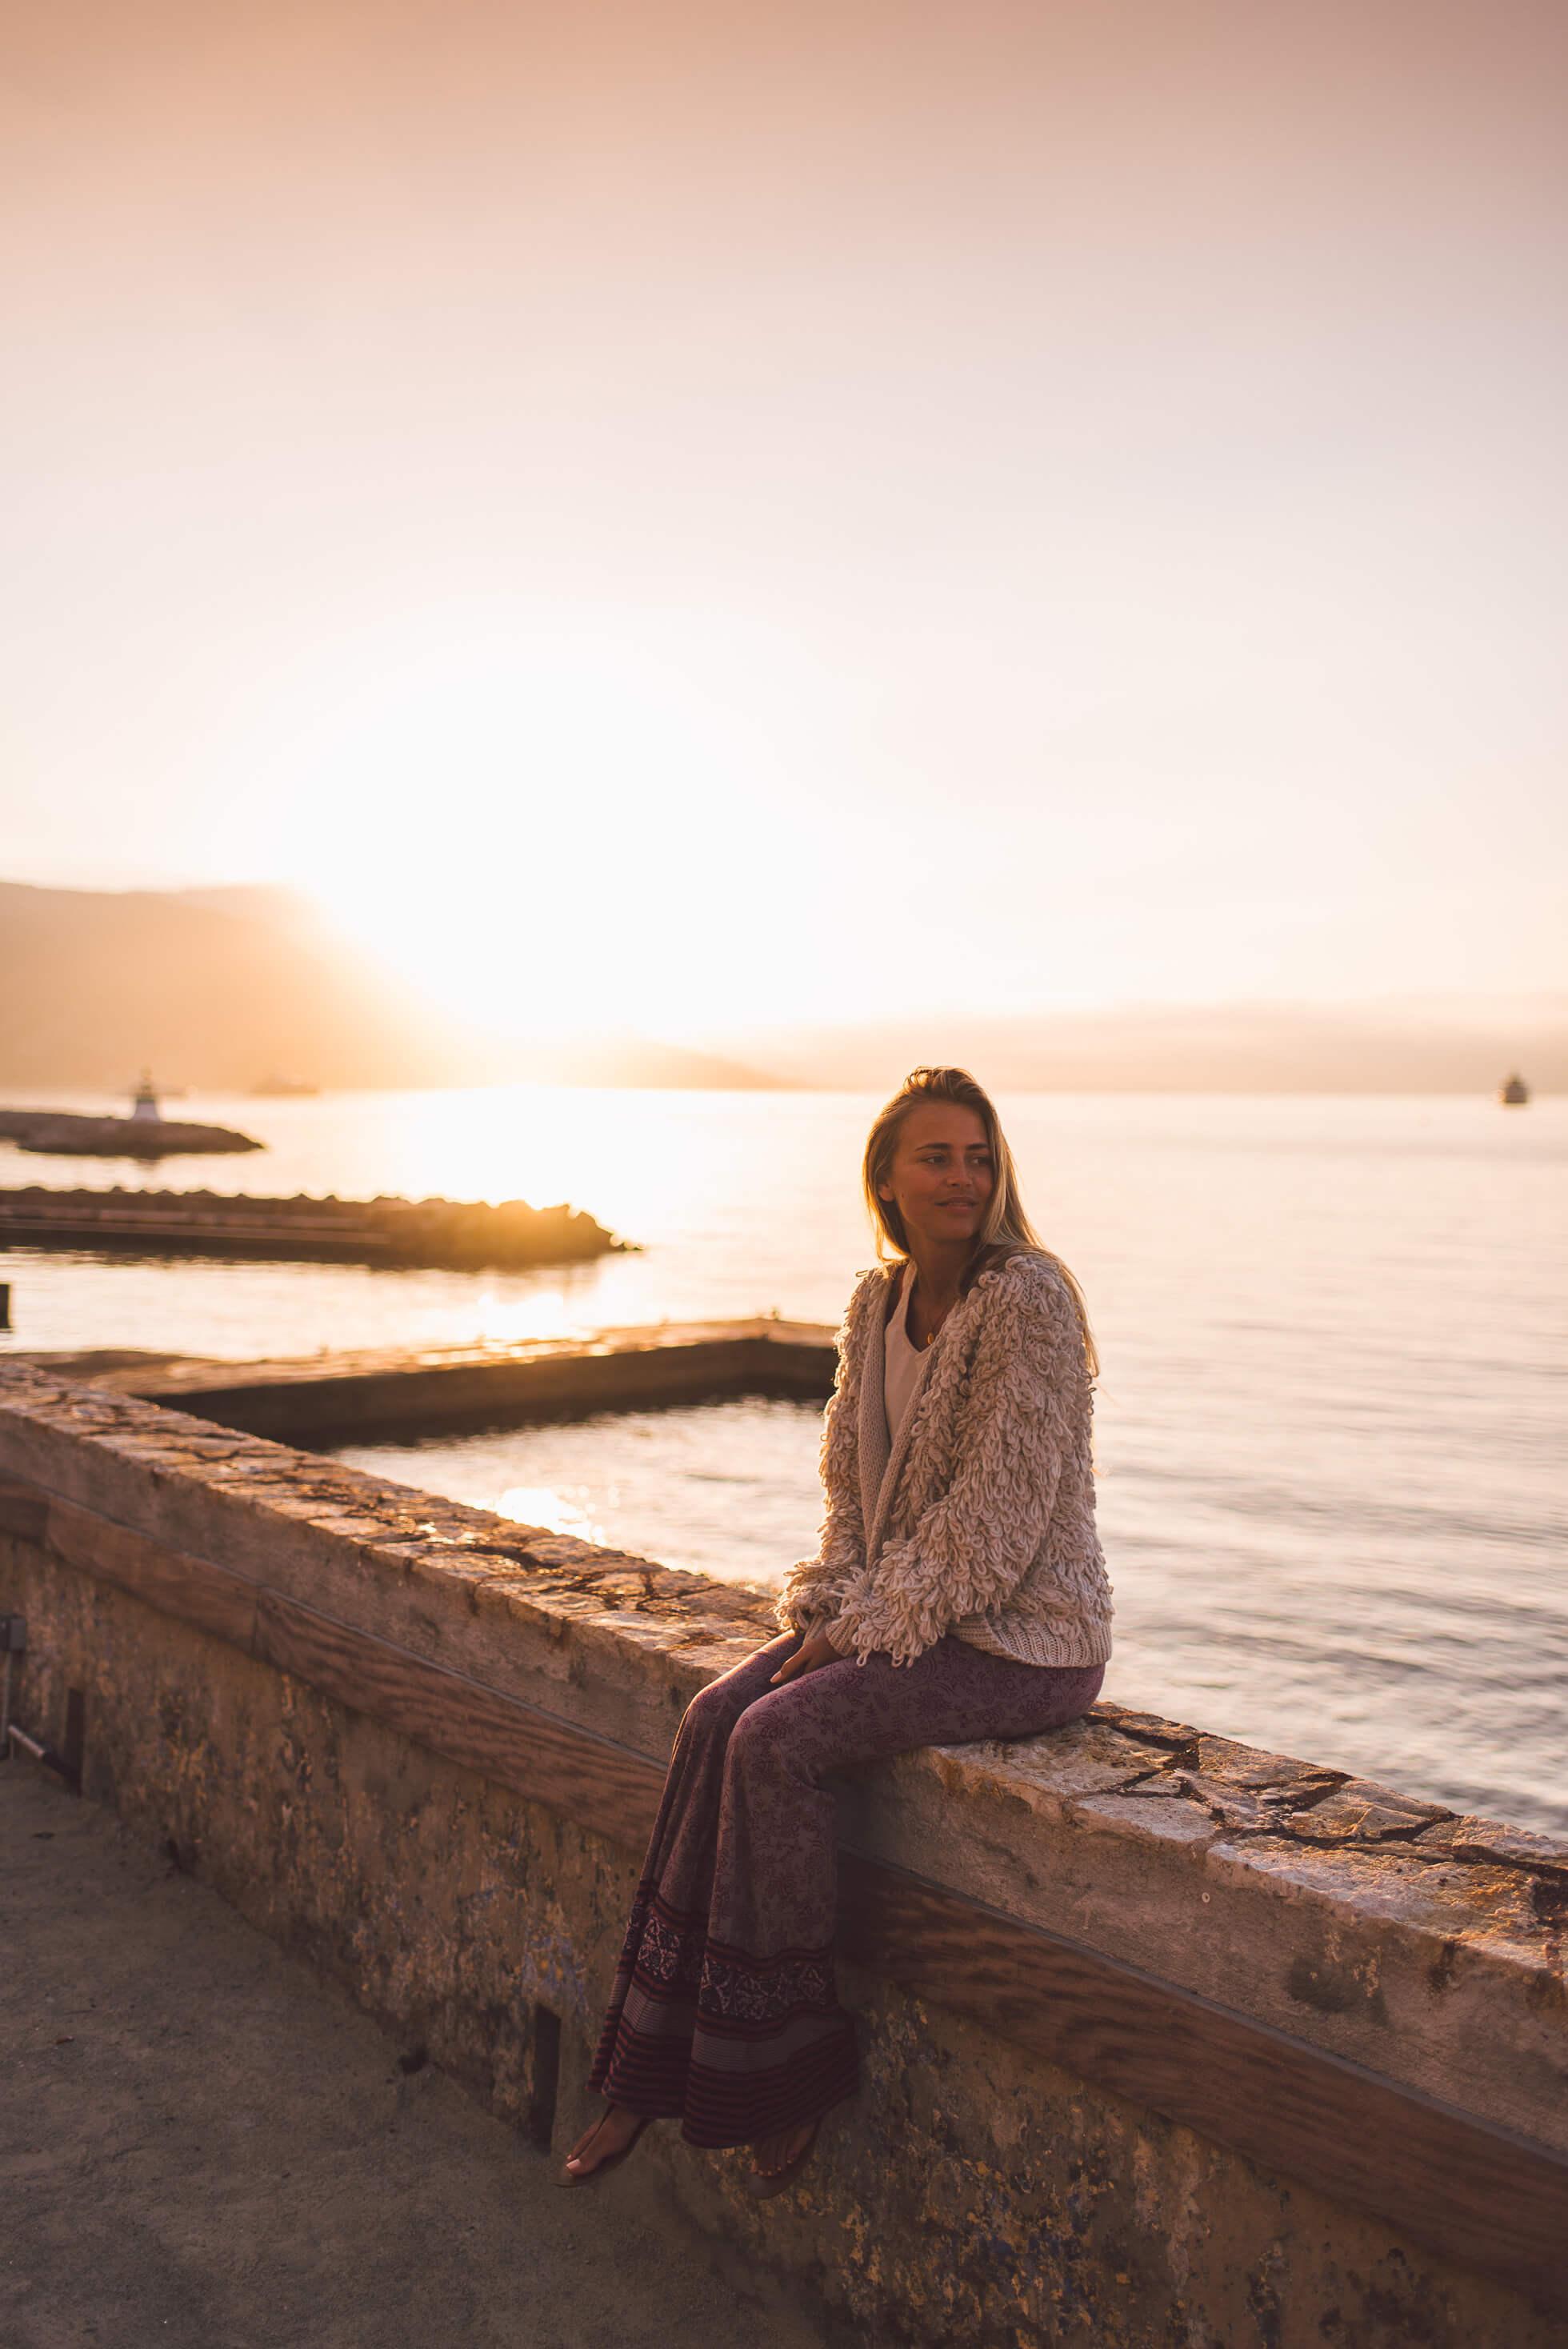 janni-deler-sunrise-berluganDSC_5855